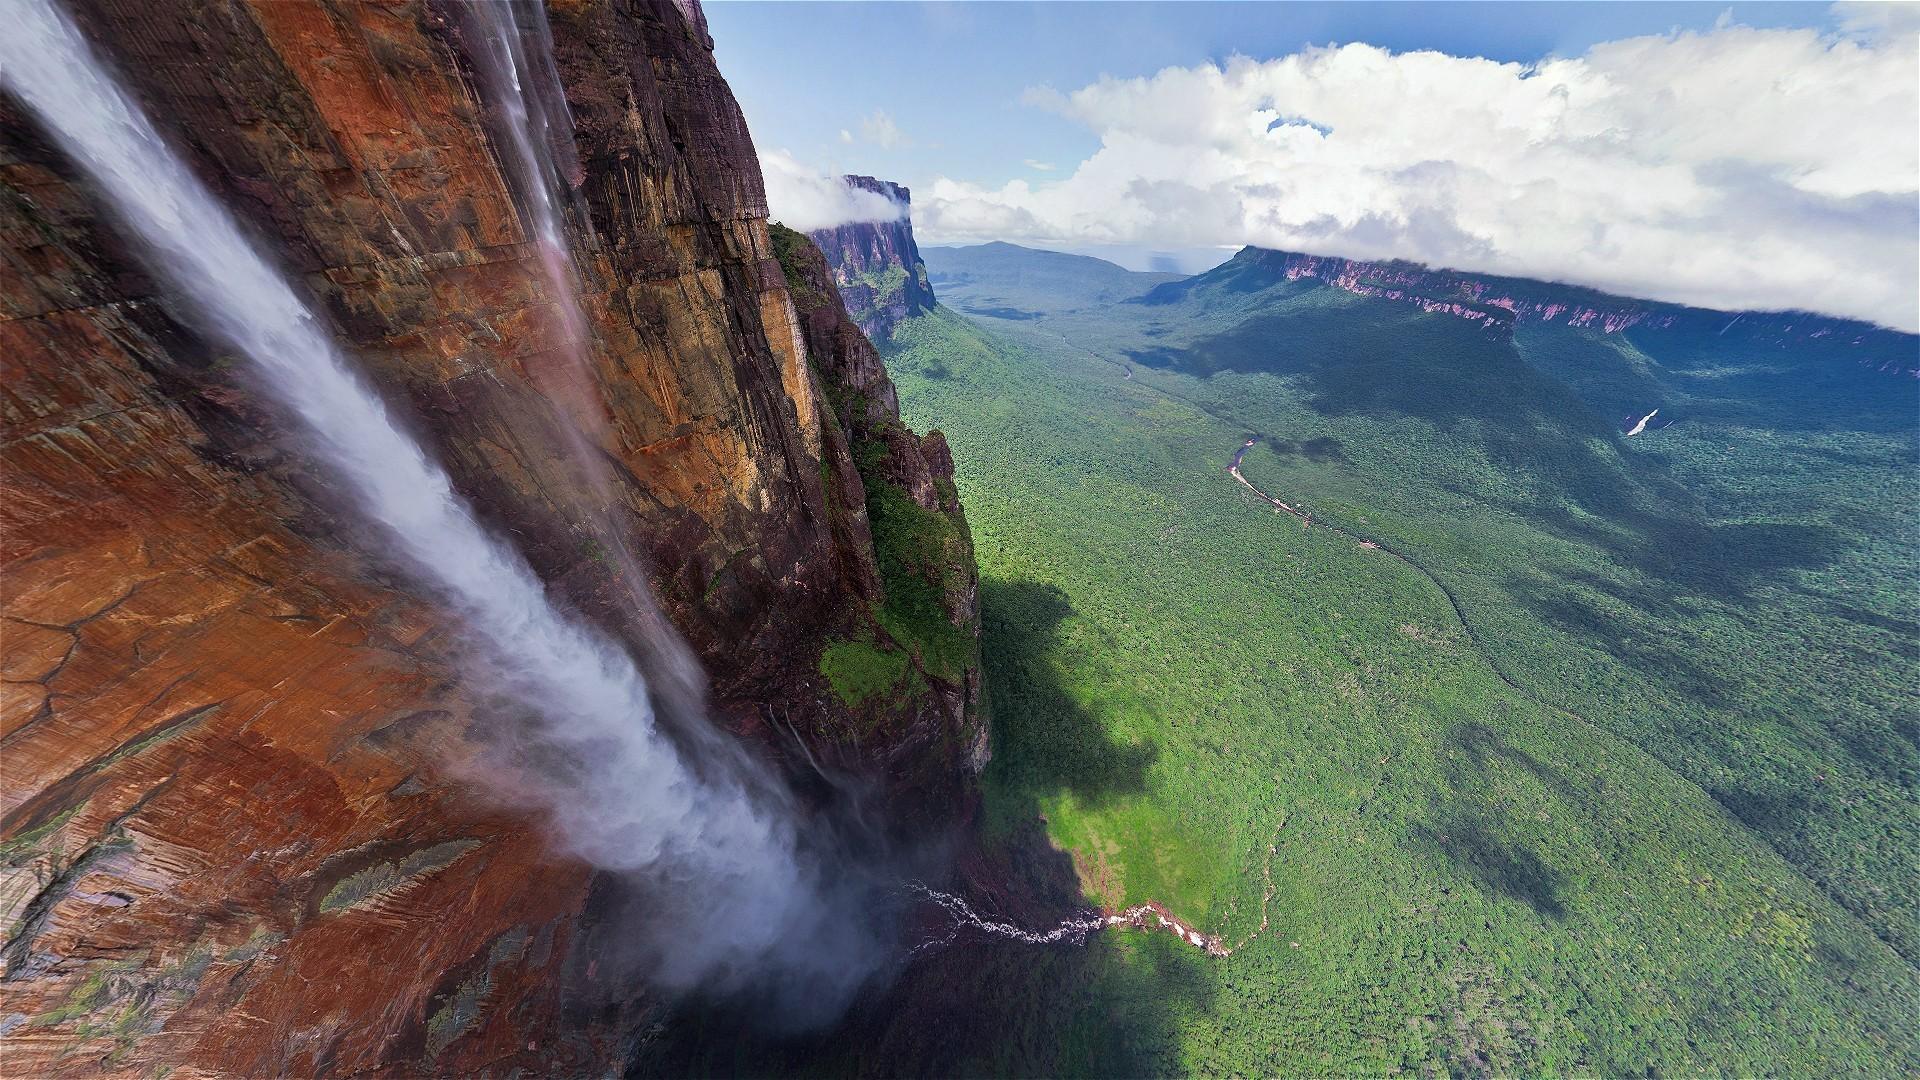 водопад, тропический, облака, каньон, пейзаж